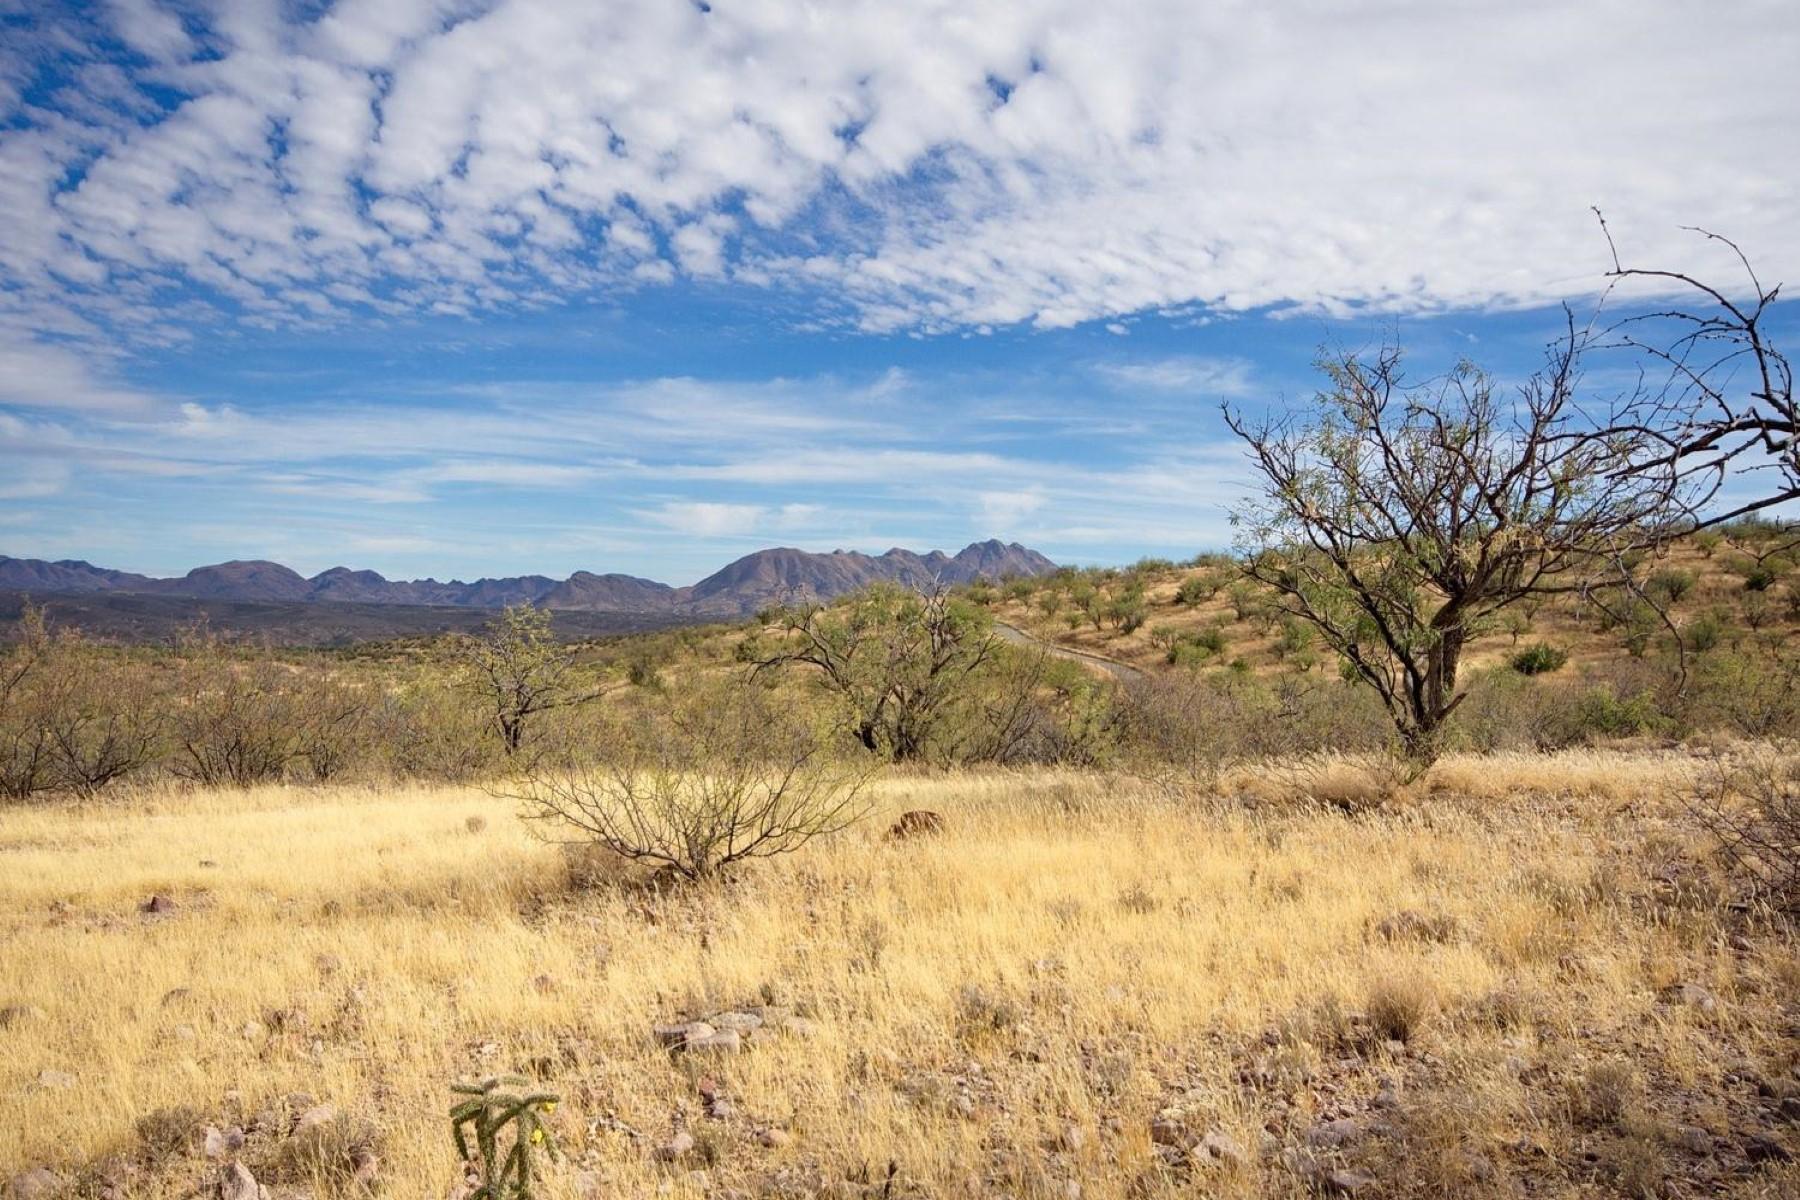 Land for Sale at 4.16 acre horse property Parcel 1 Vista De Torres Tubac, Arizona, 85646 United States